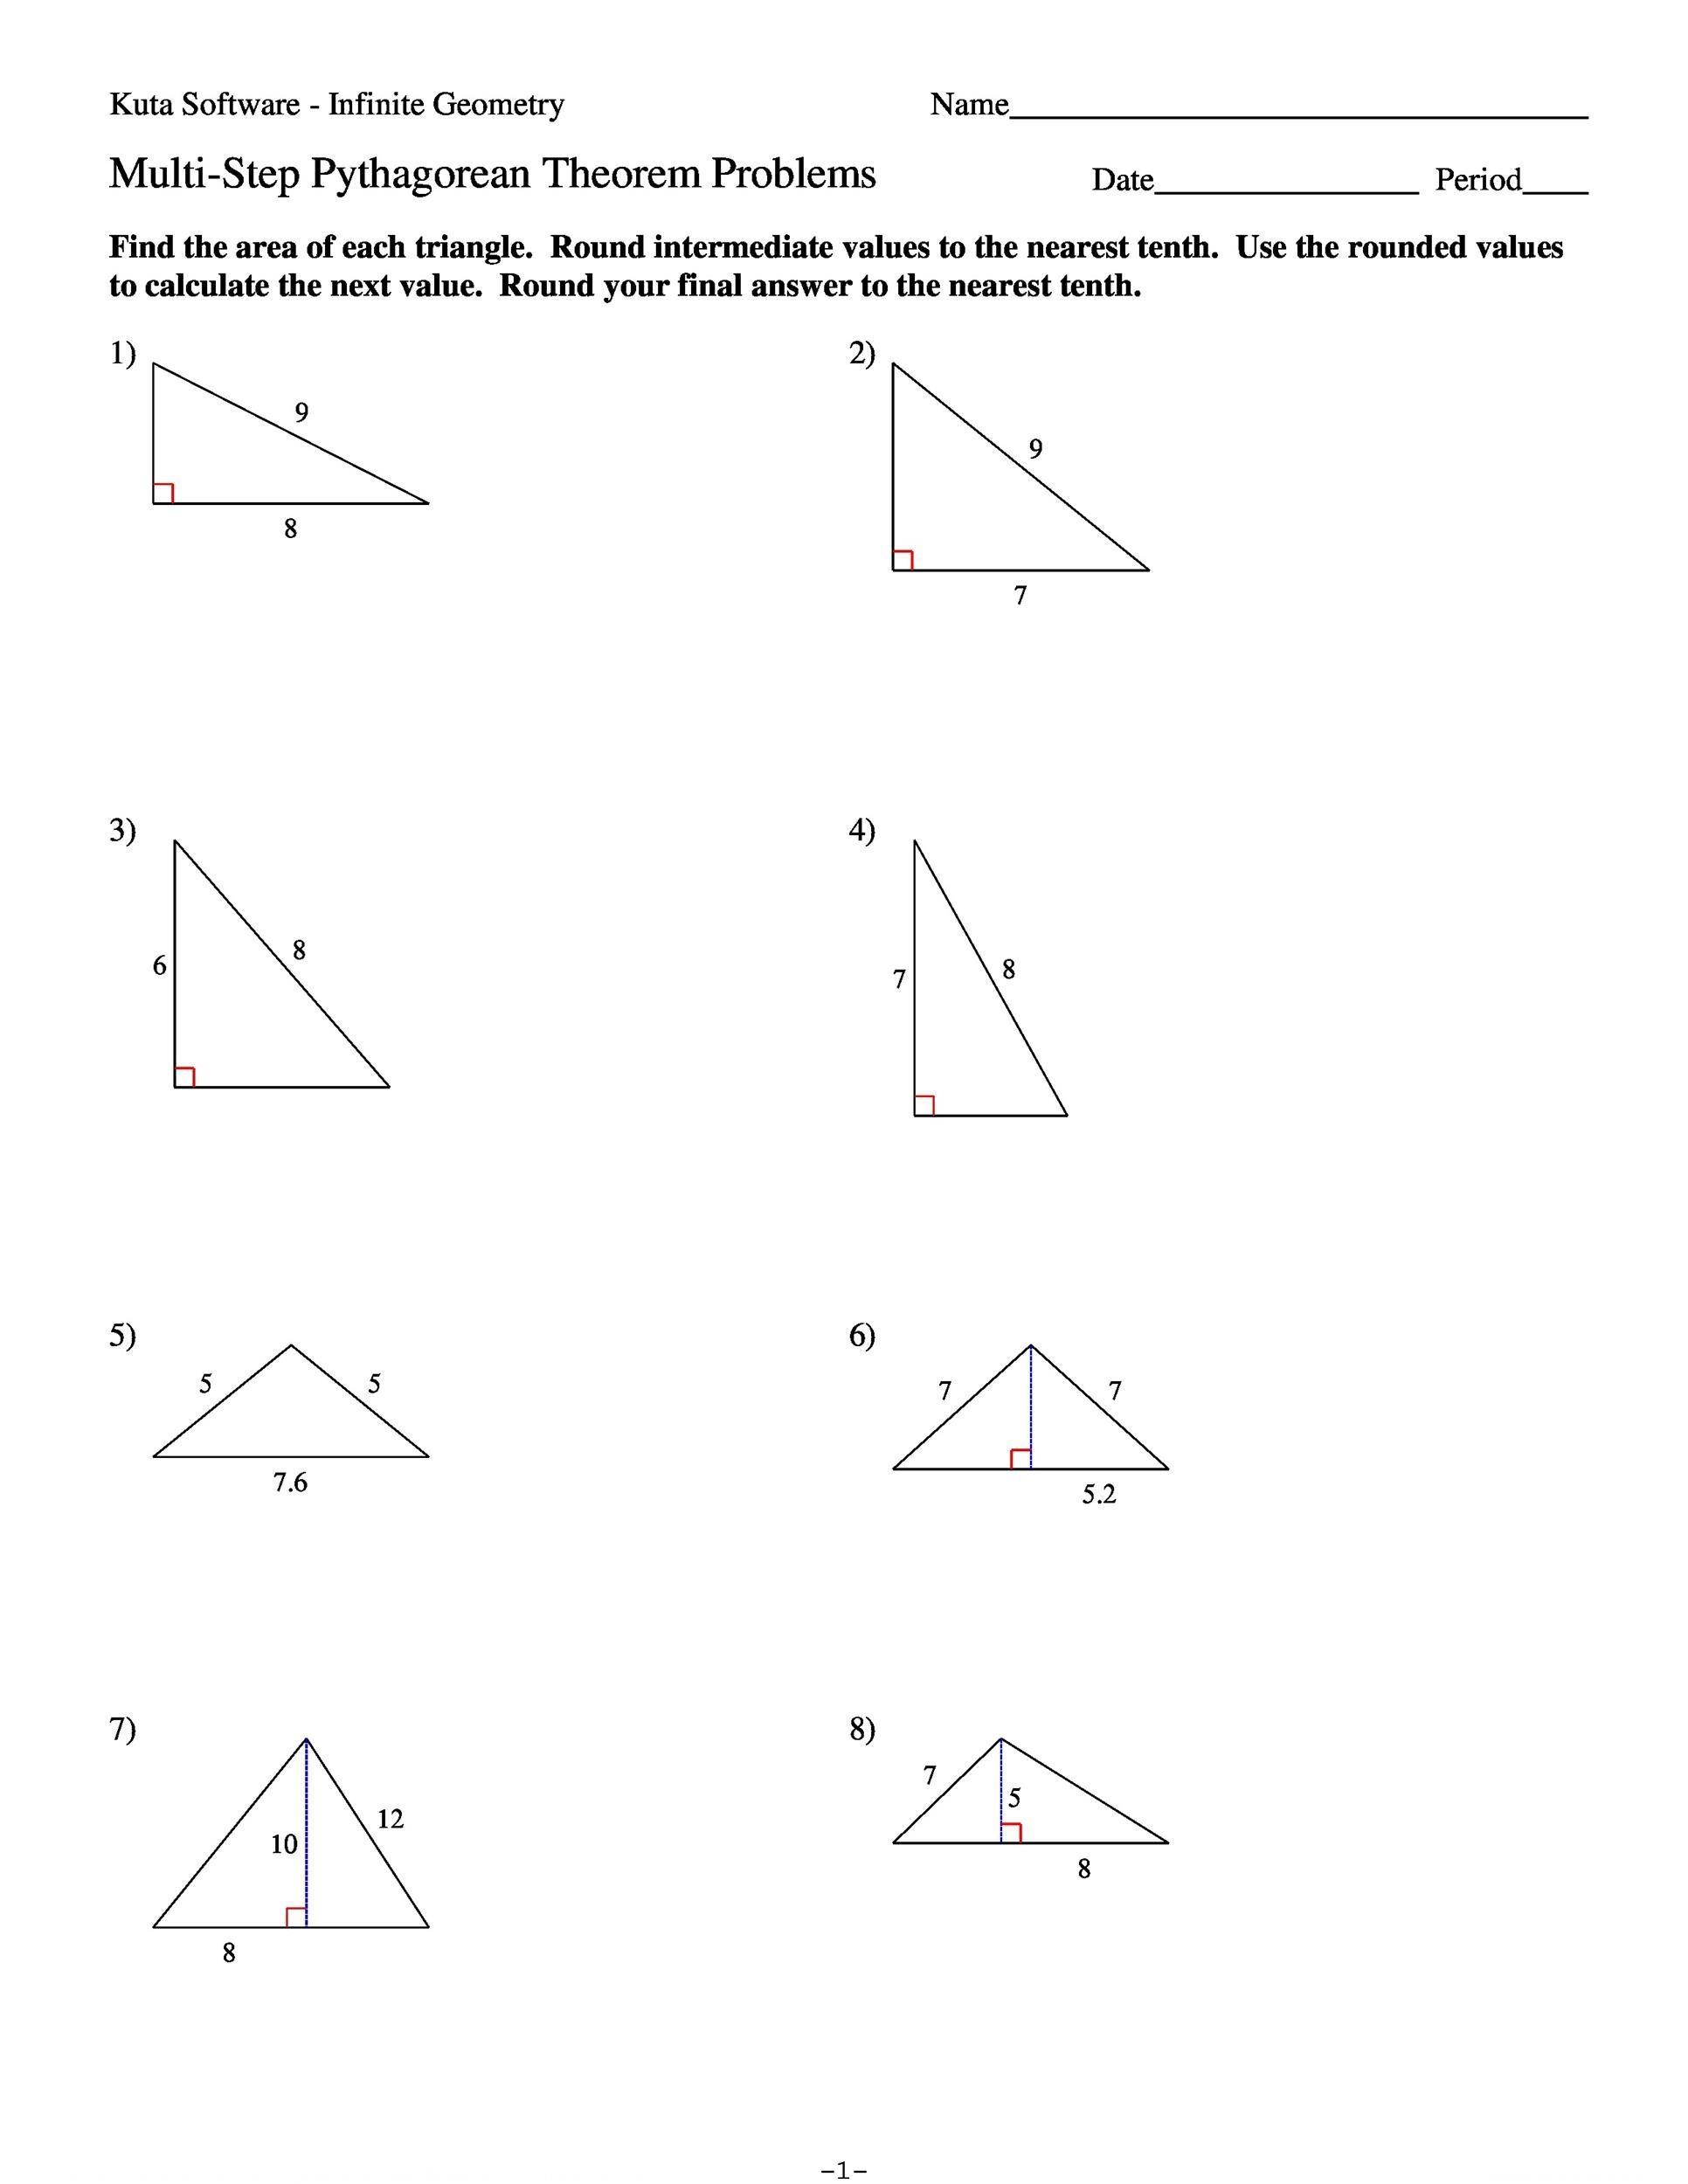 Free pythagorean theorem 08